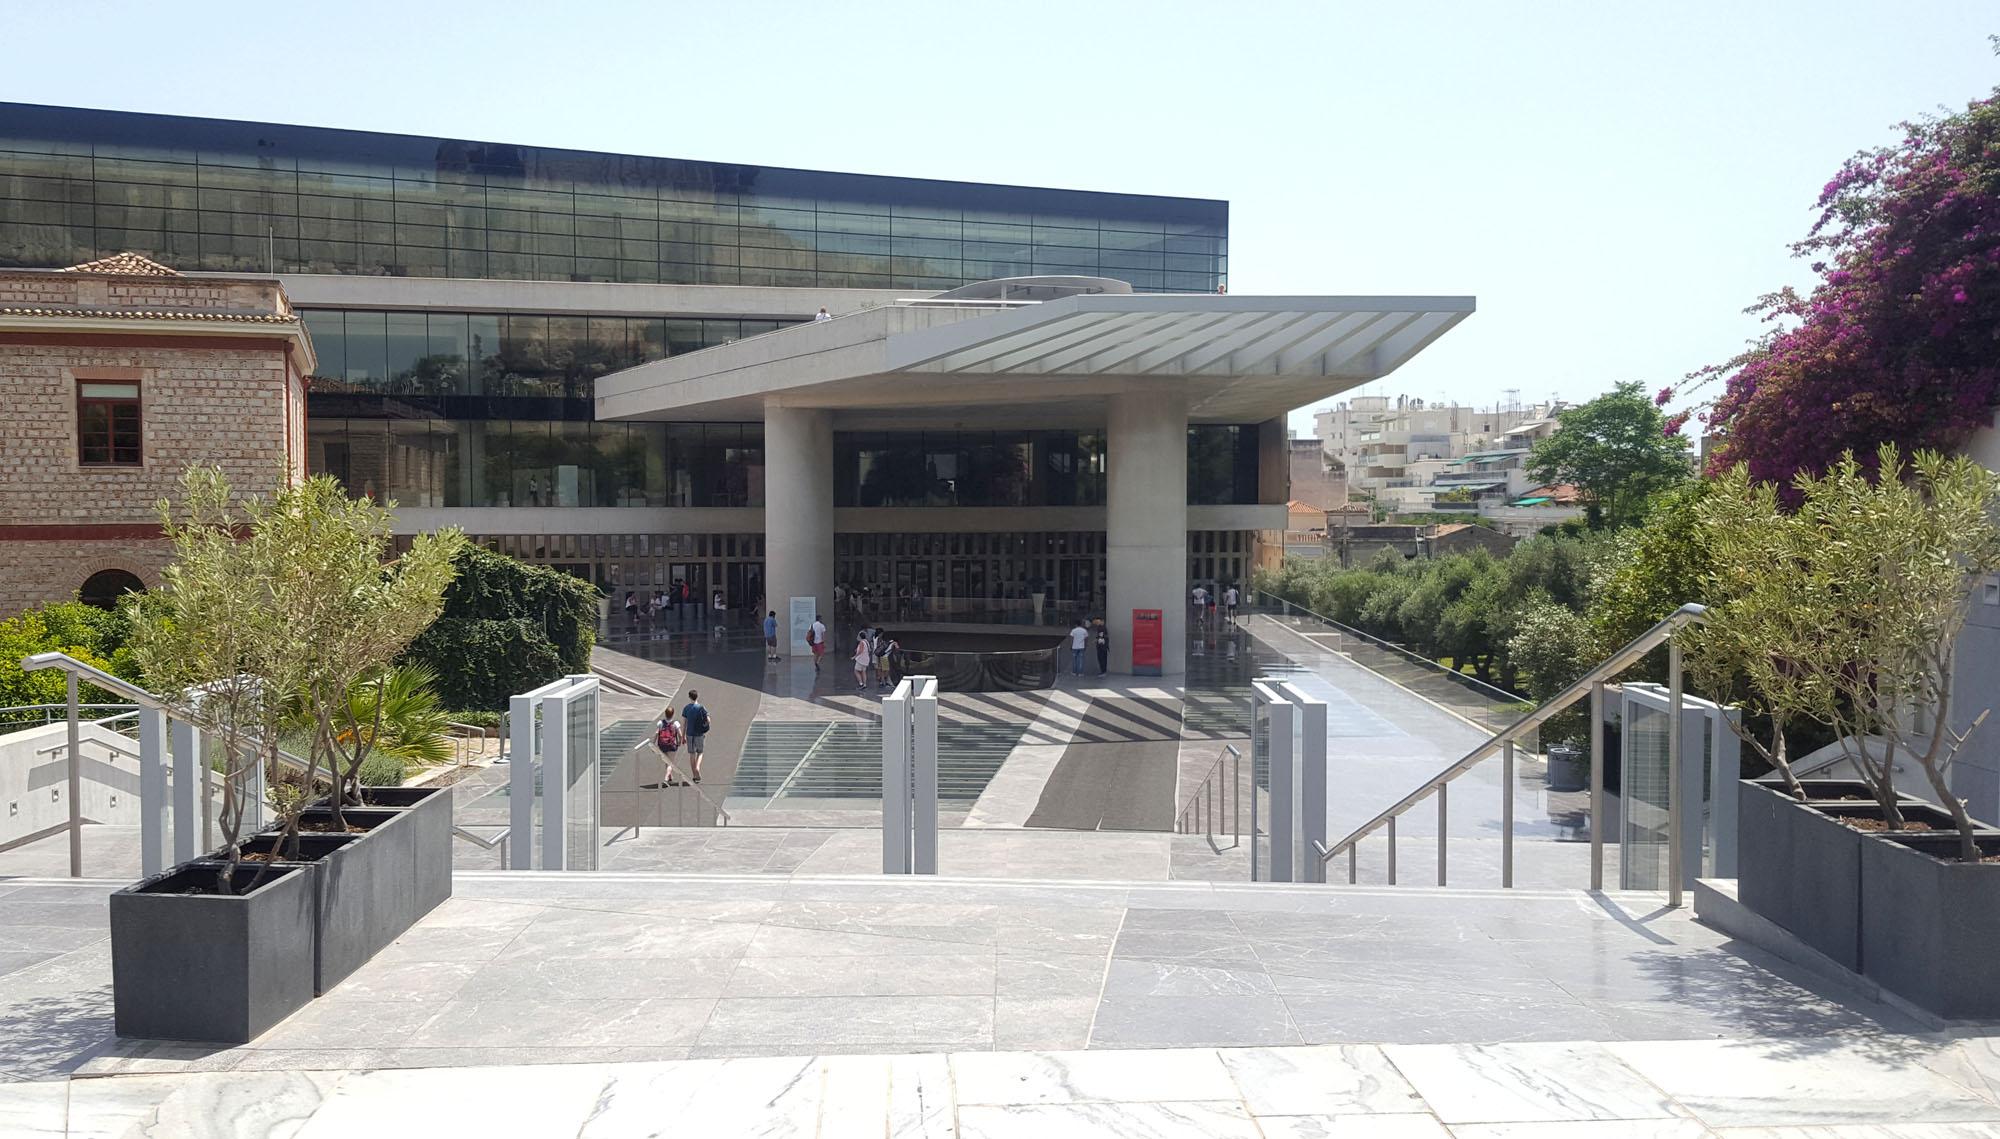 Akropolismuseum Athene